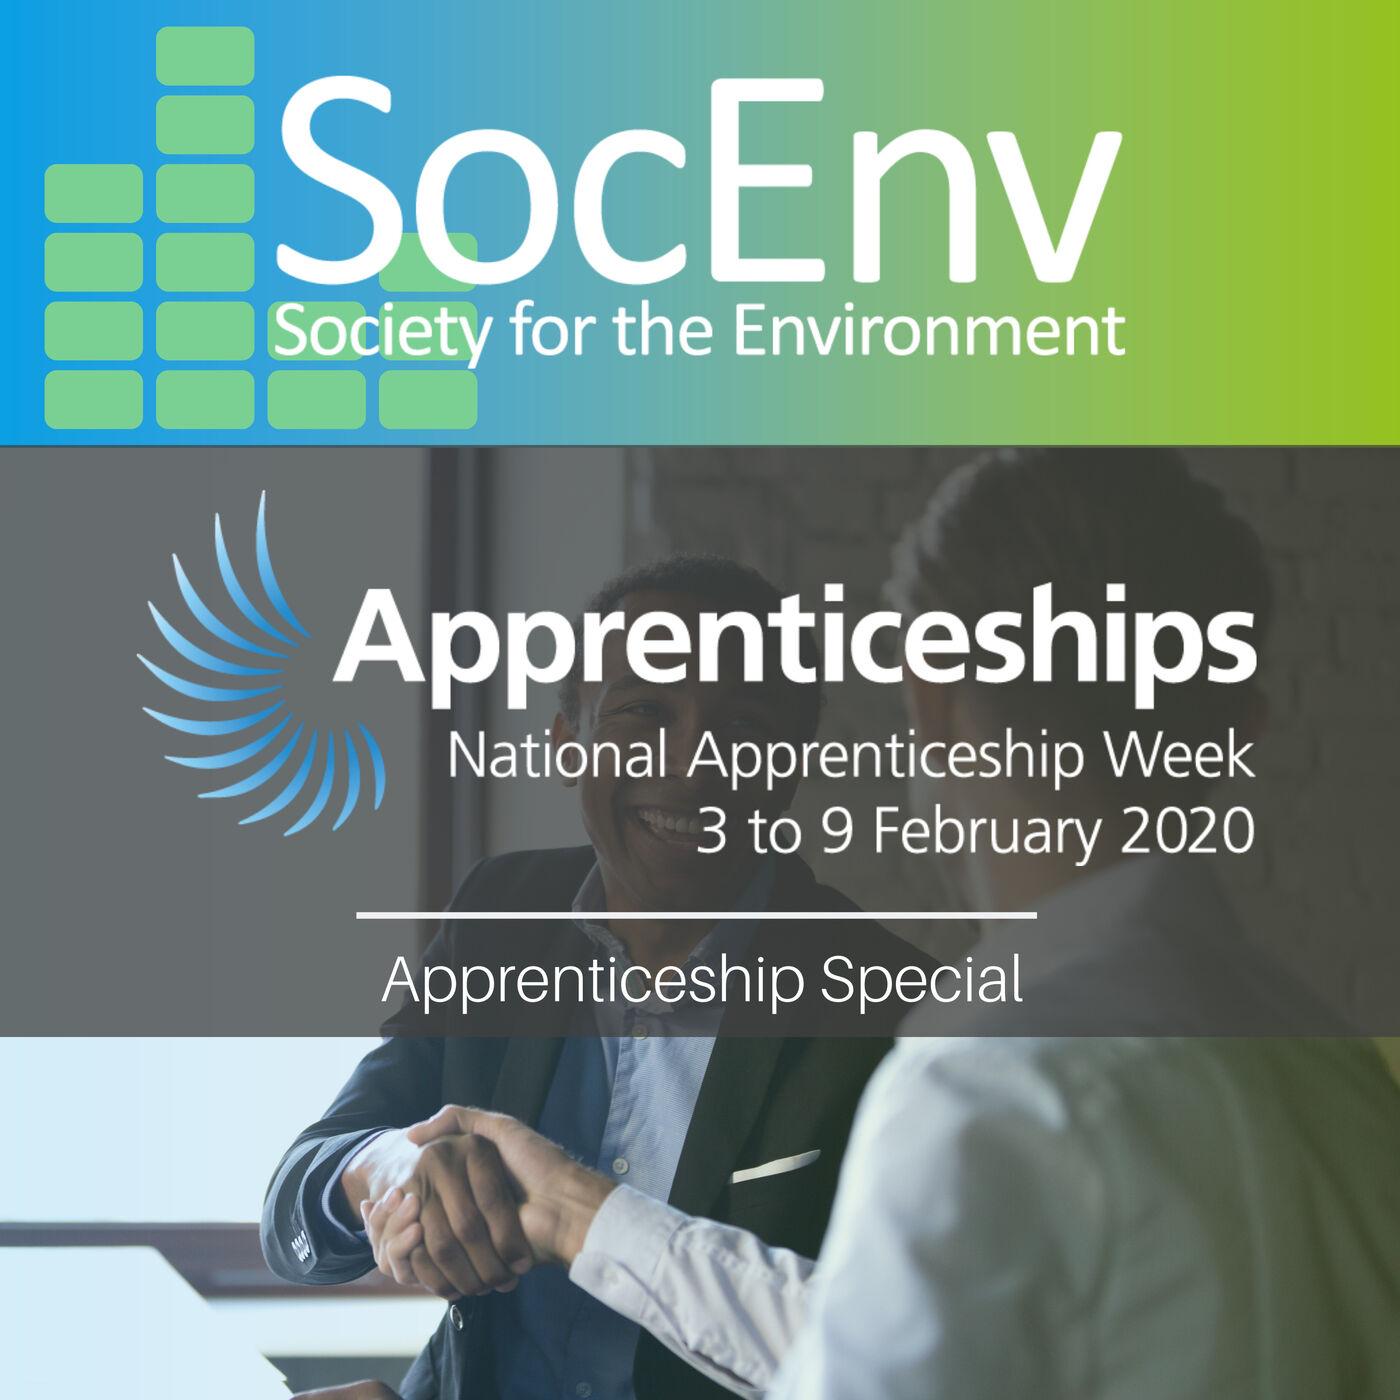 National Apprenticeship Week Special